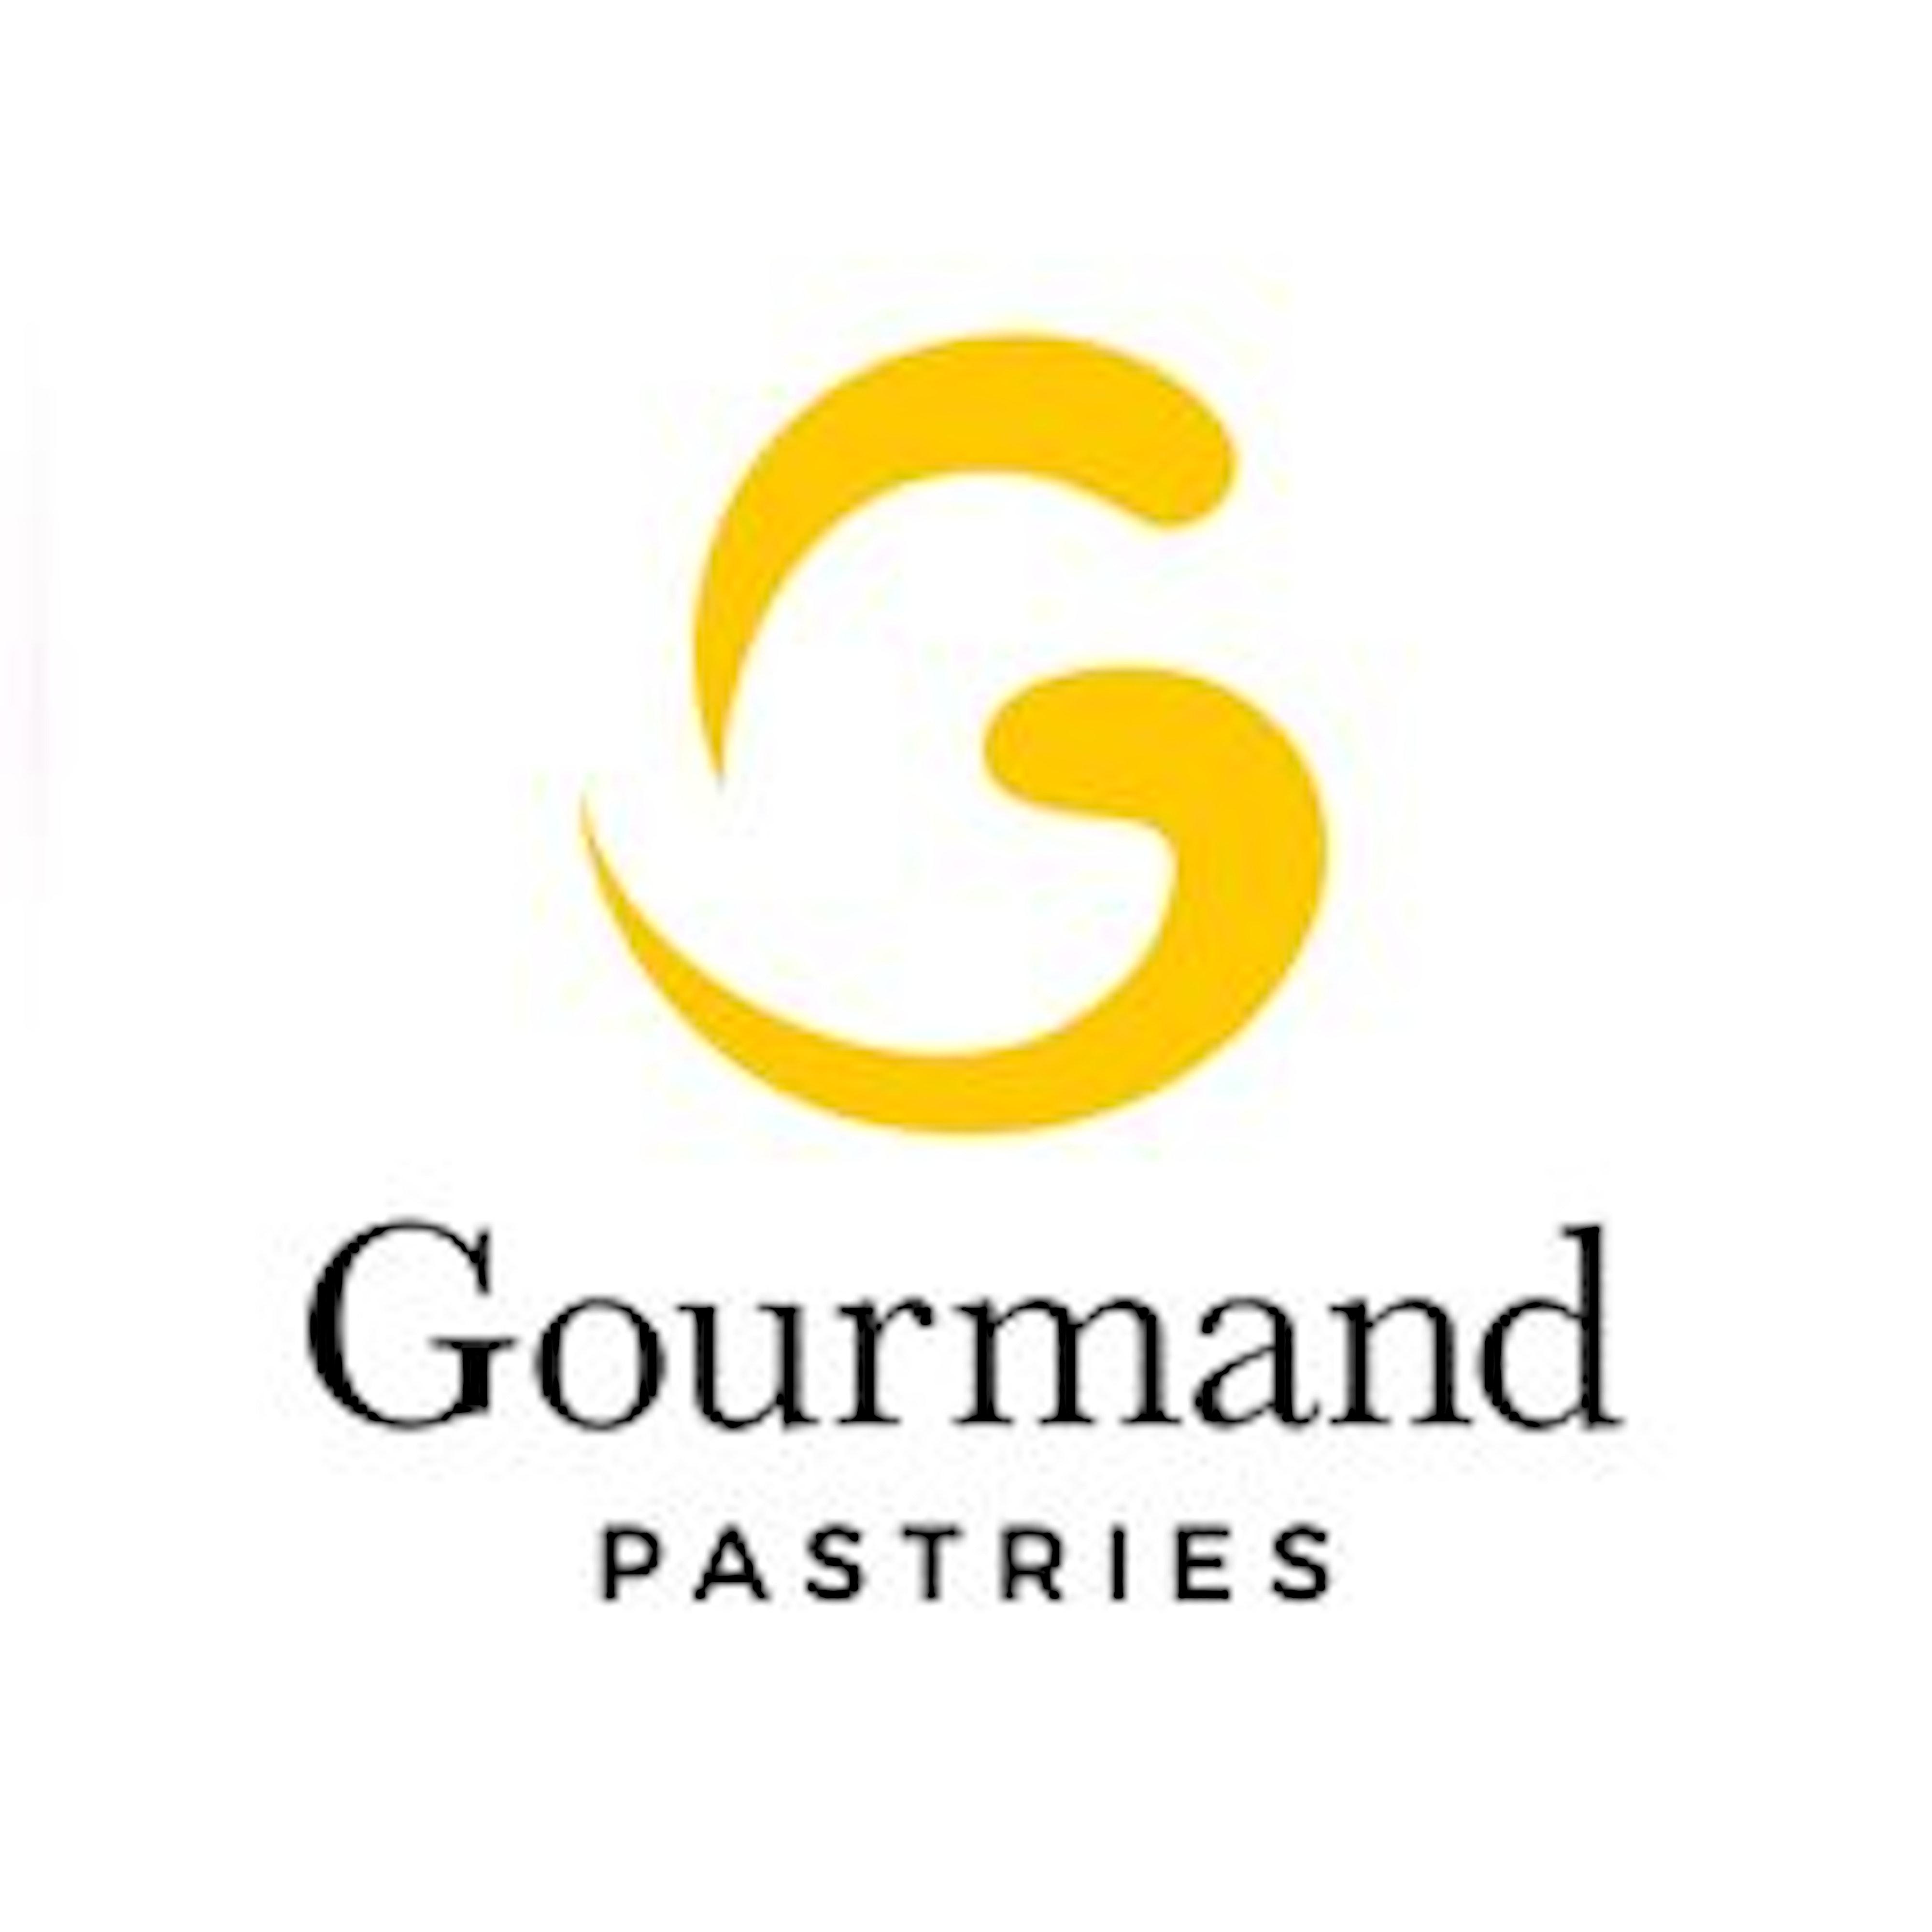 Gourmand Pastries logo